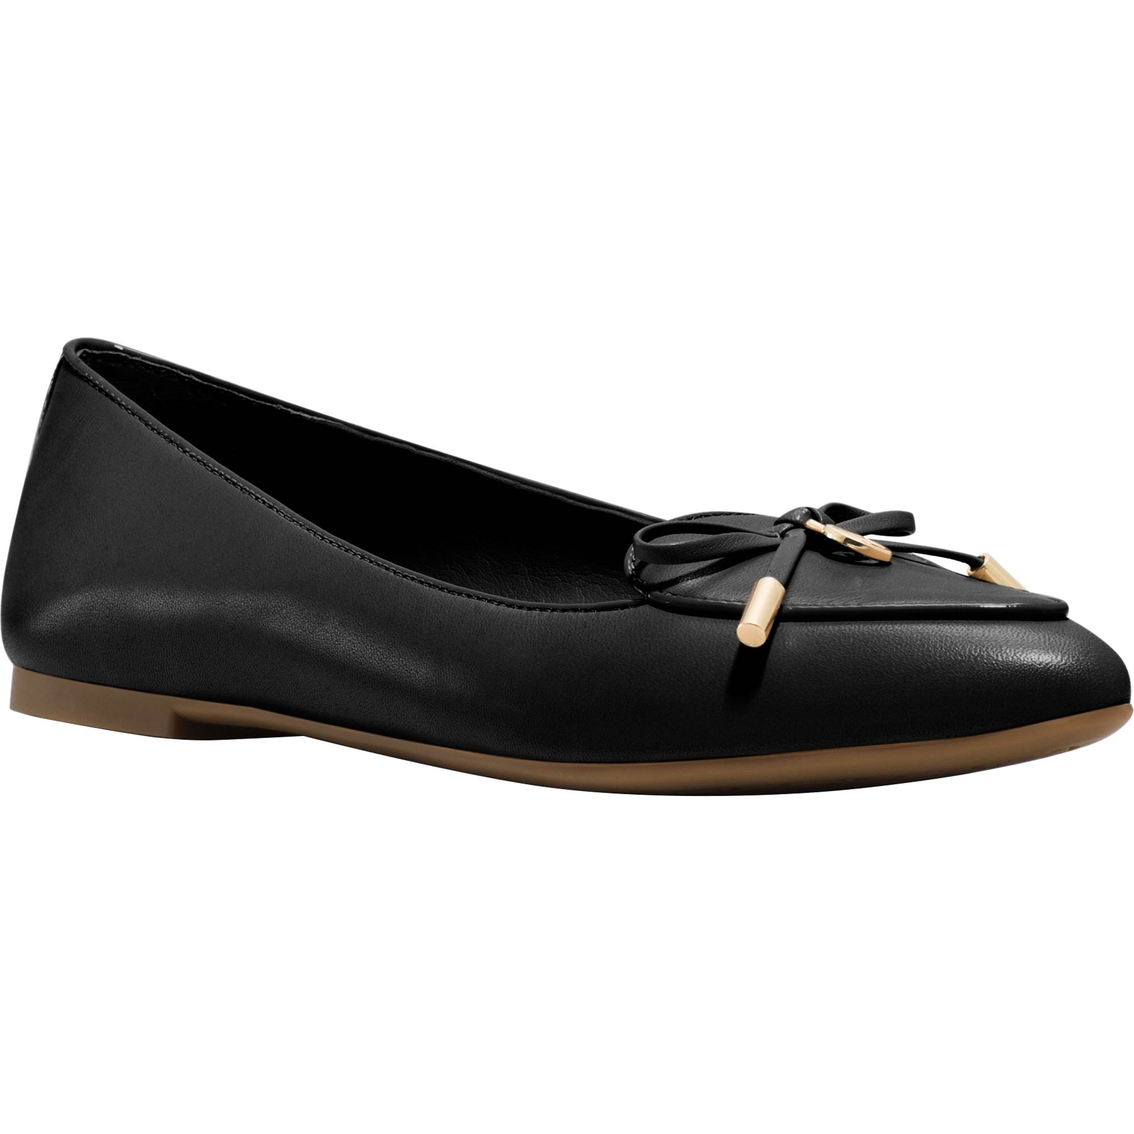 Michael Kors Nancy Flats | Shoes | Shop